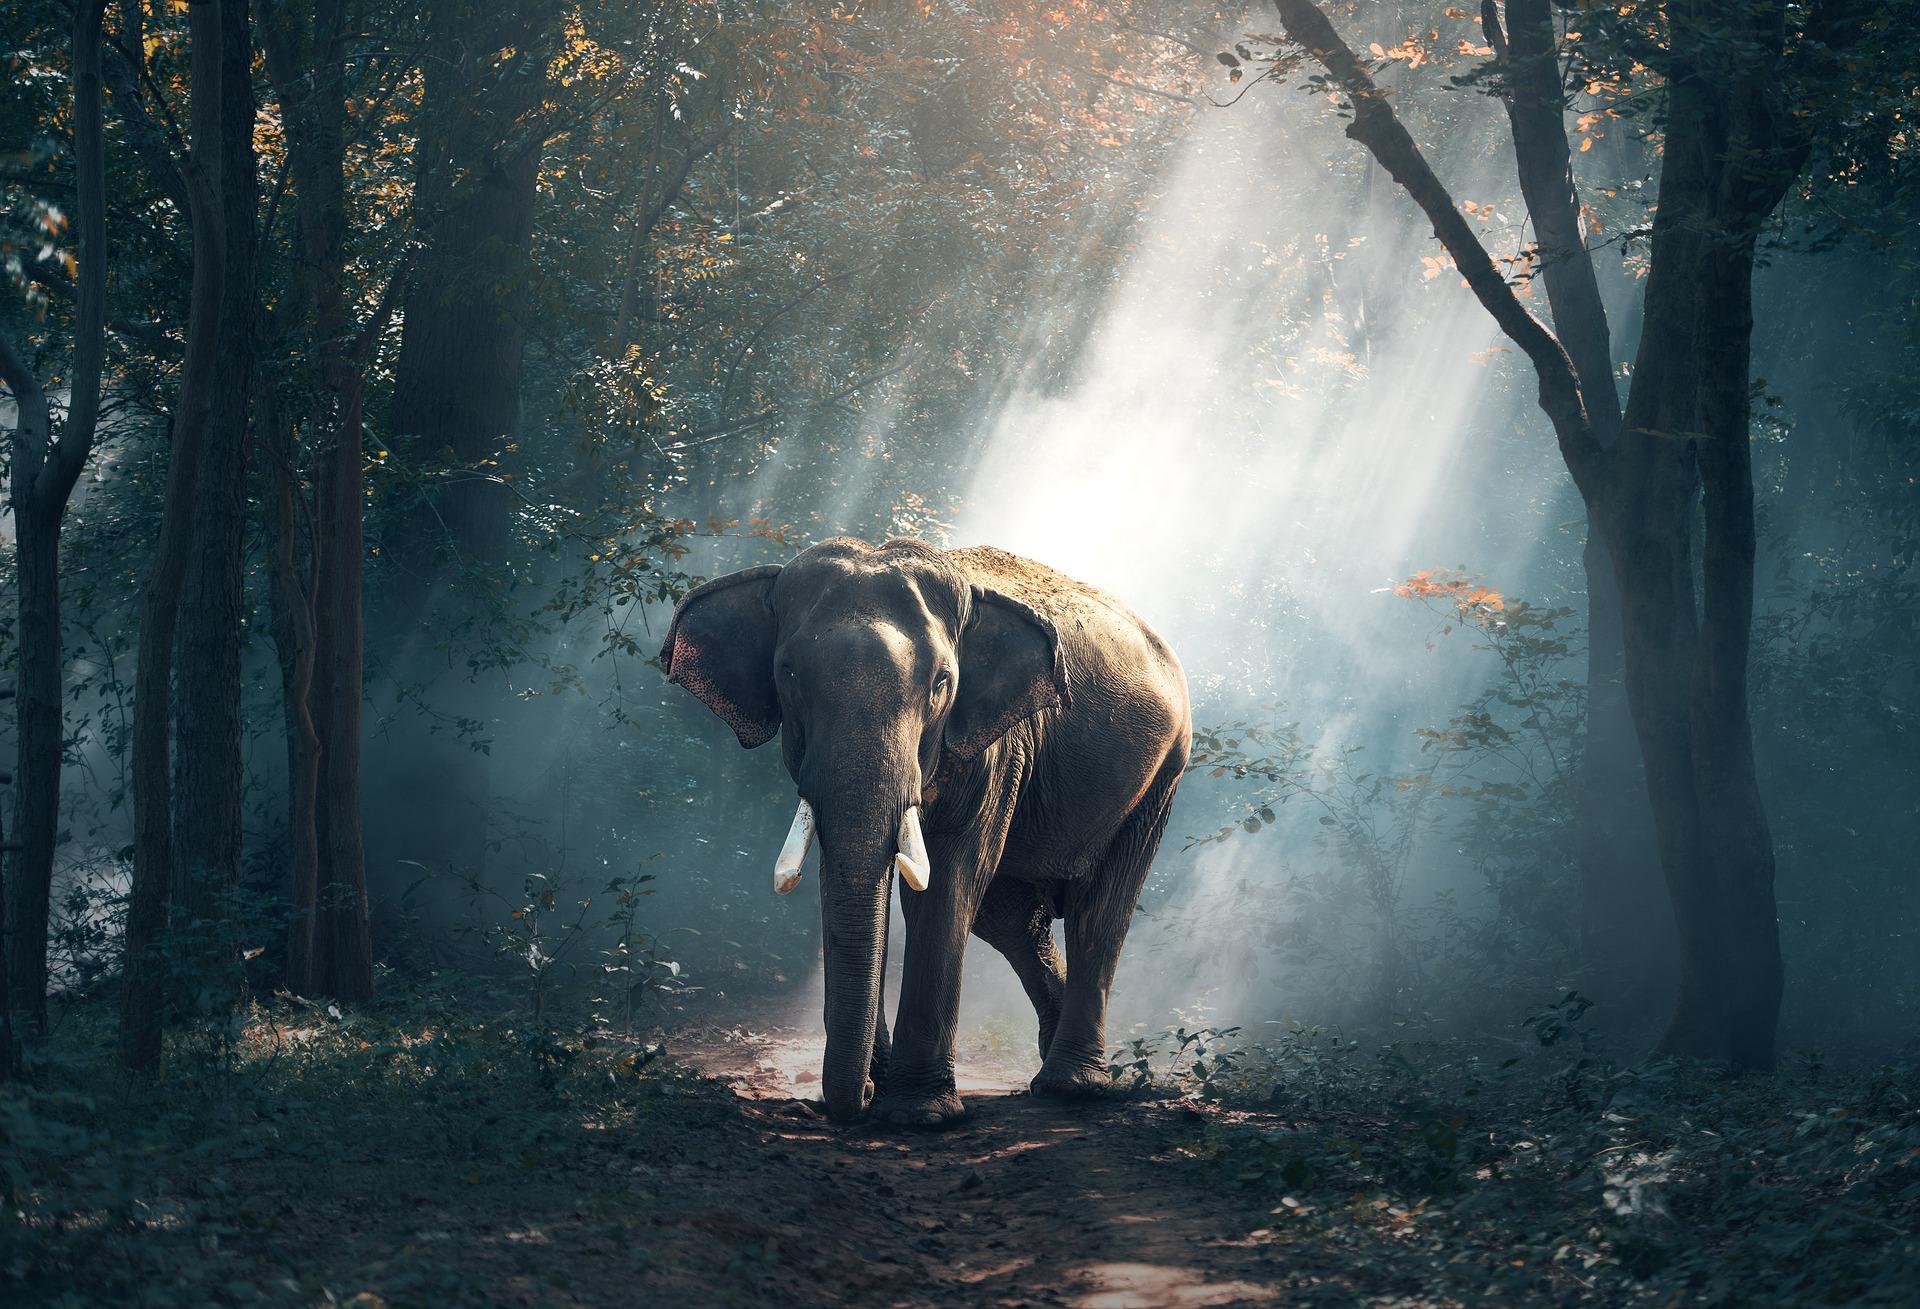 elephant-1822636_1920.jpg